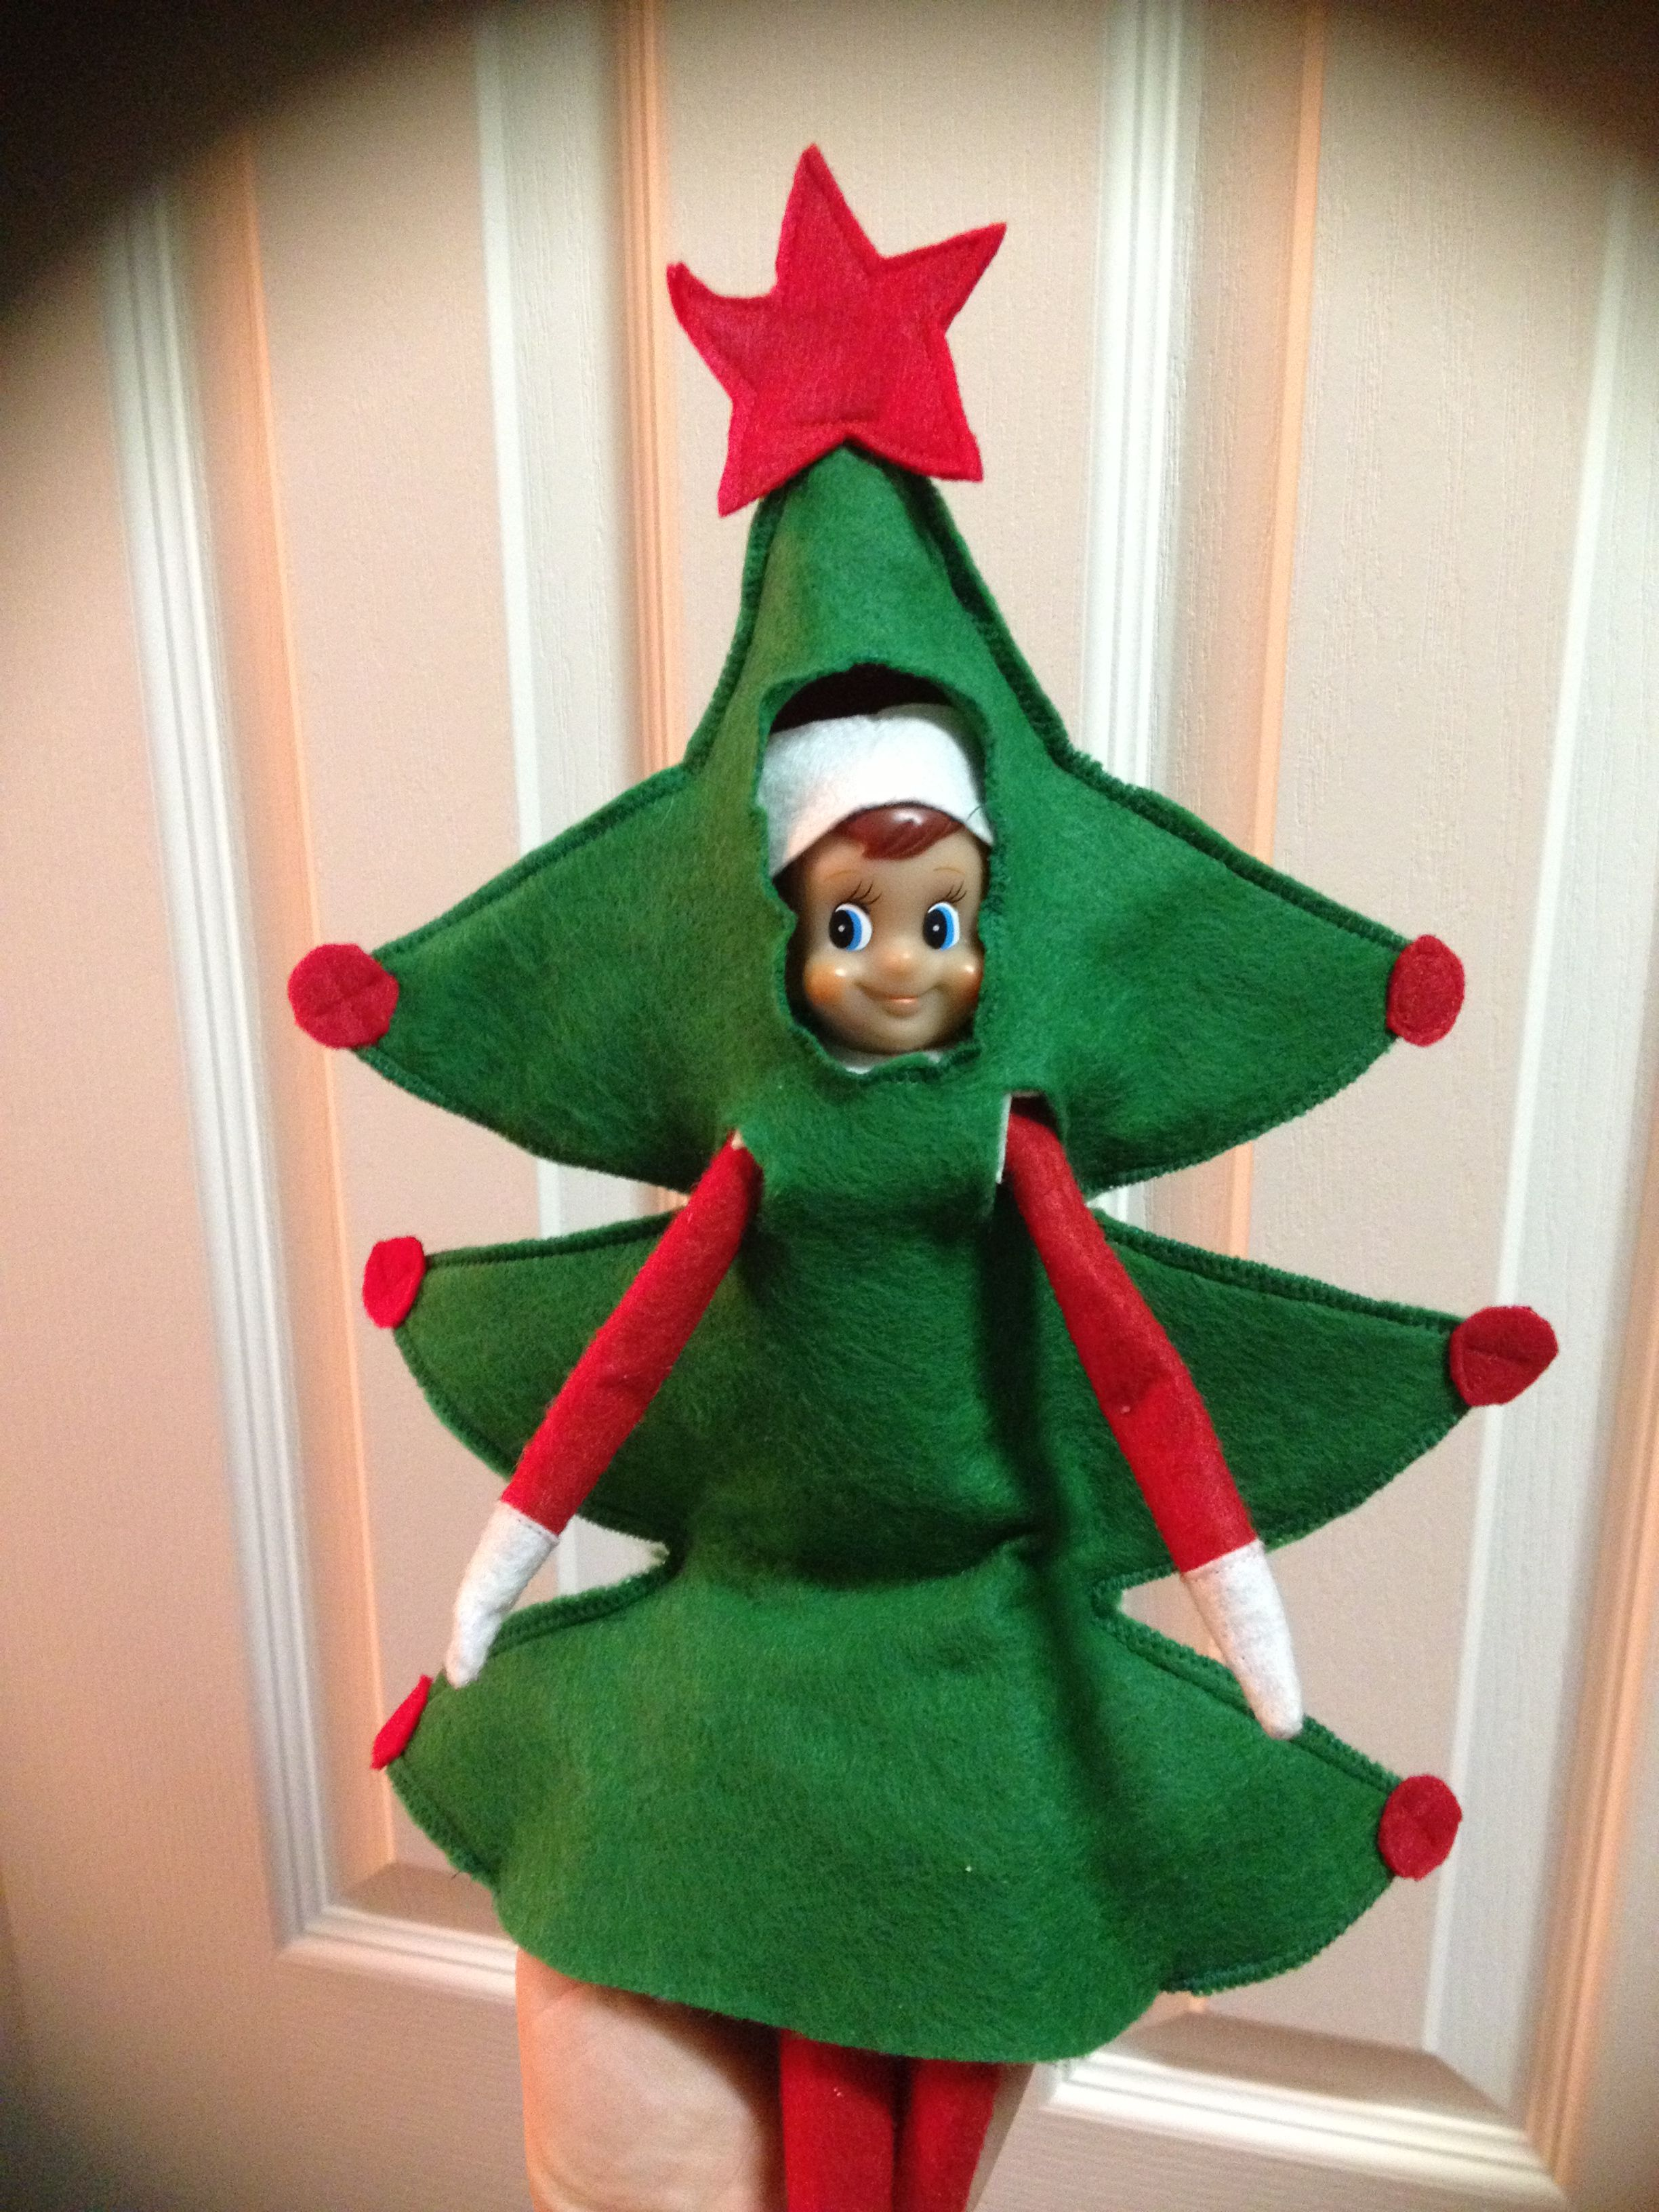 Xmas tree costume ideas ✓ the halloween and makeup